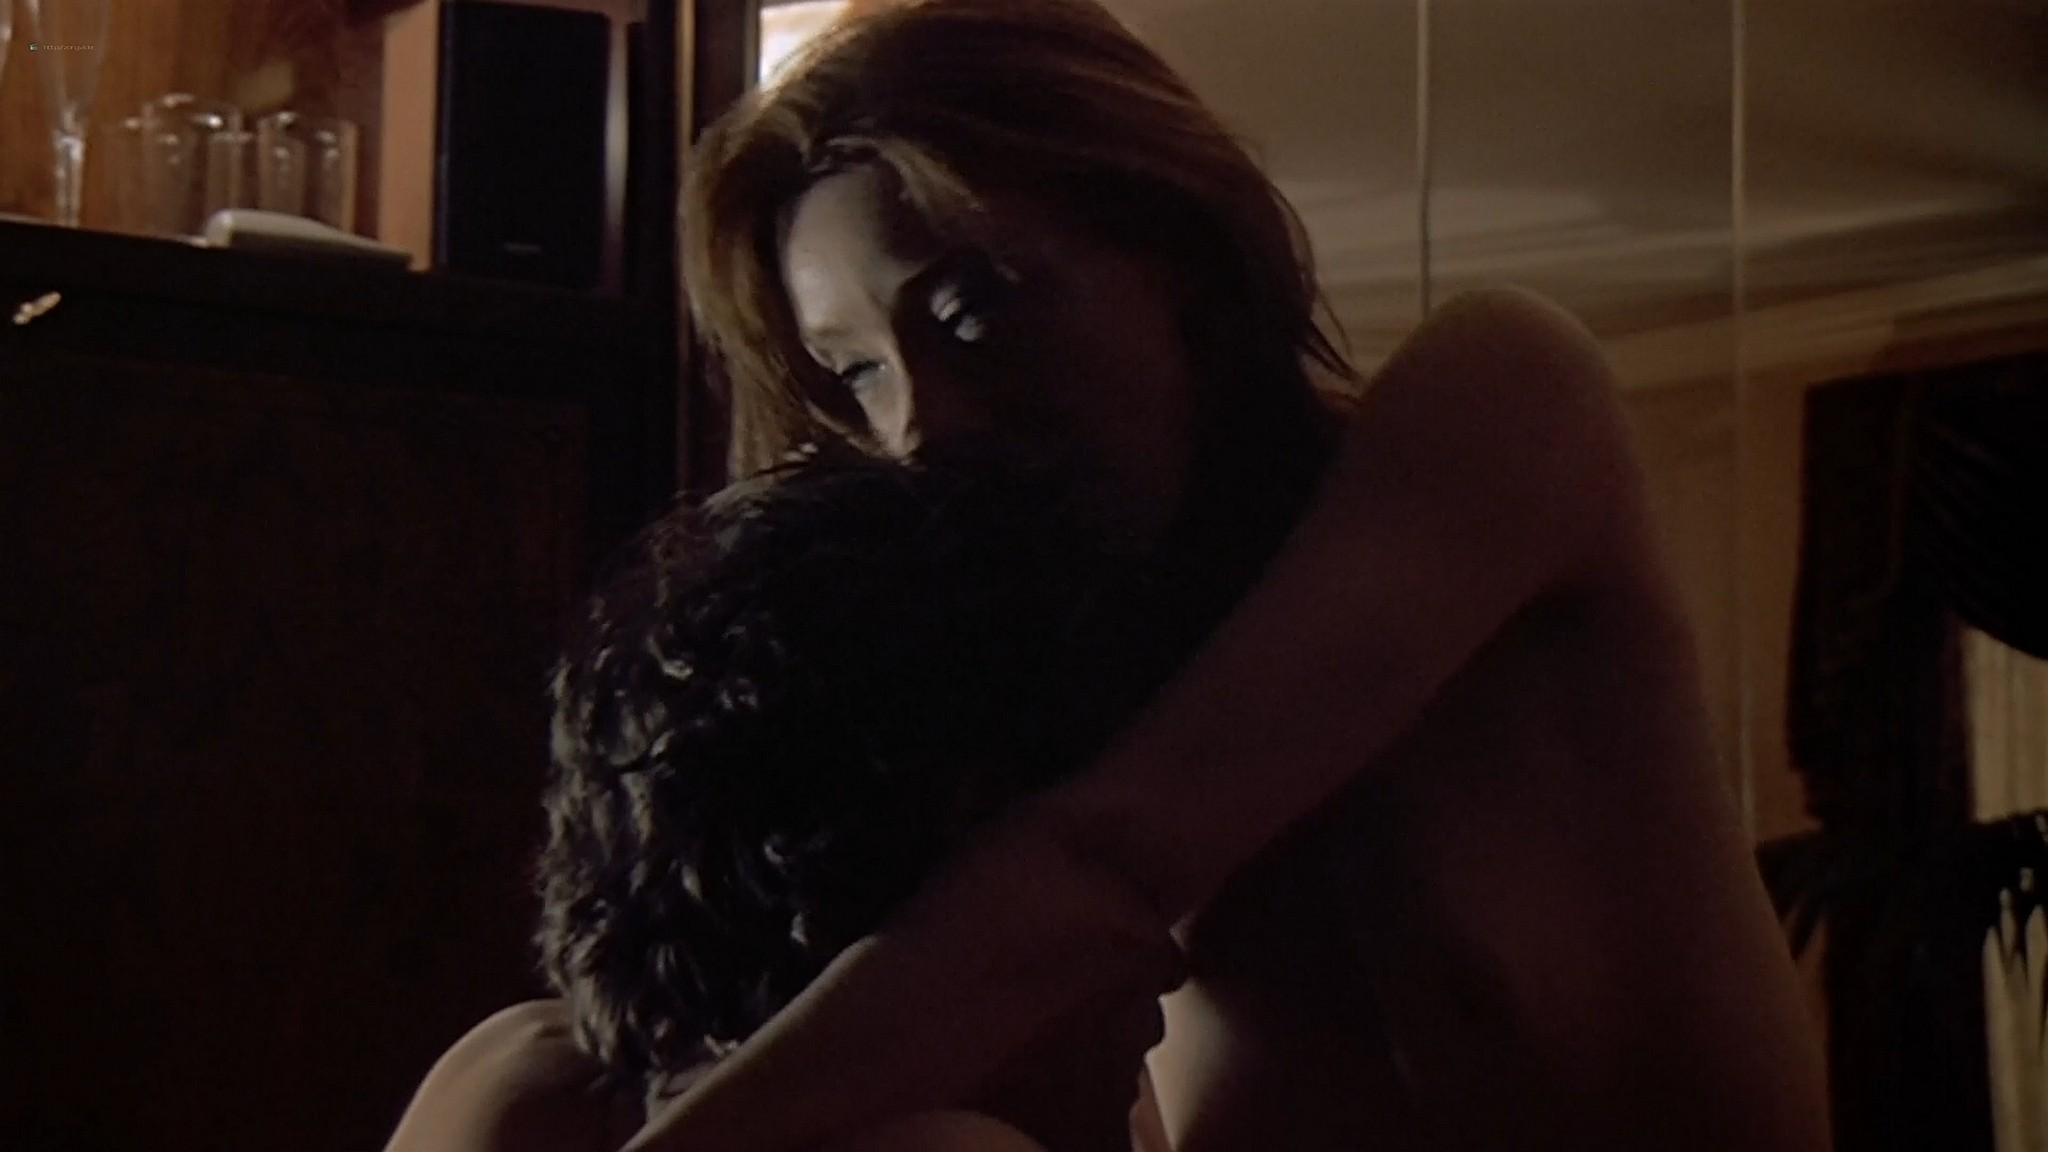 Molly Parker nude sex Alisha Klass explicit Carla Gugino sexy The Center of the World 2001 1080p 8